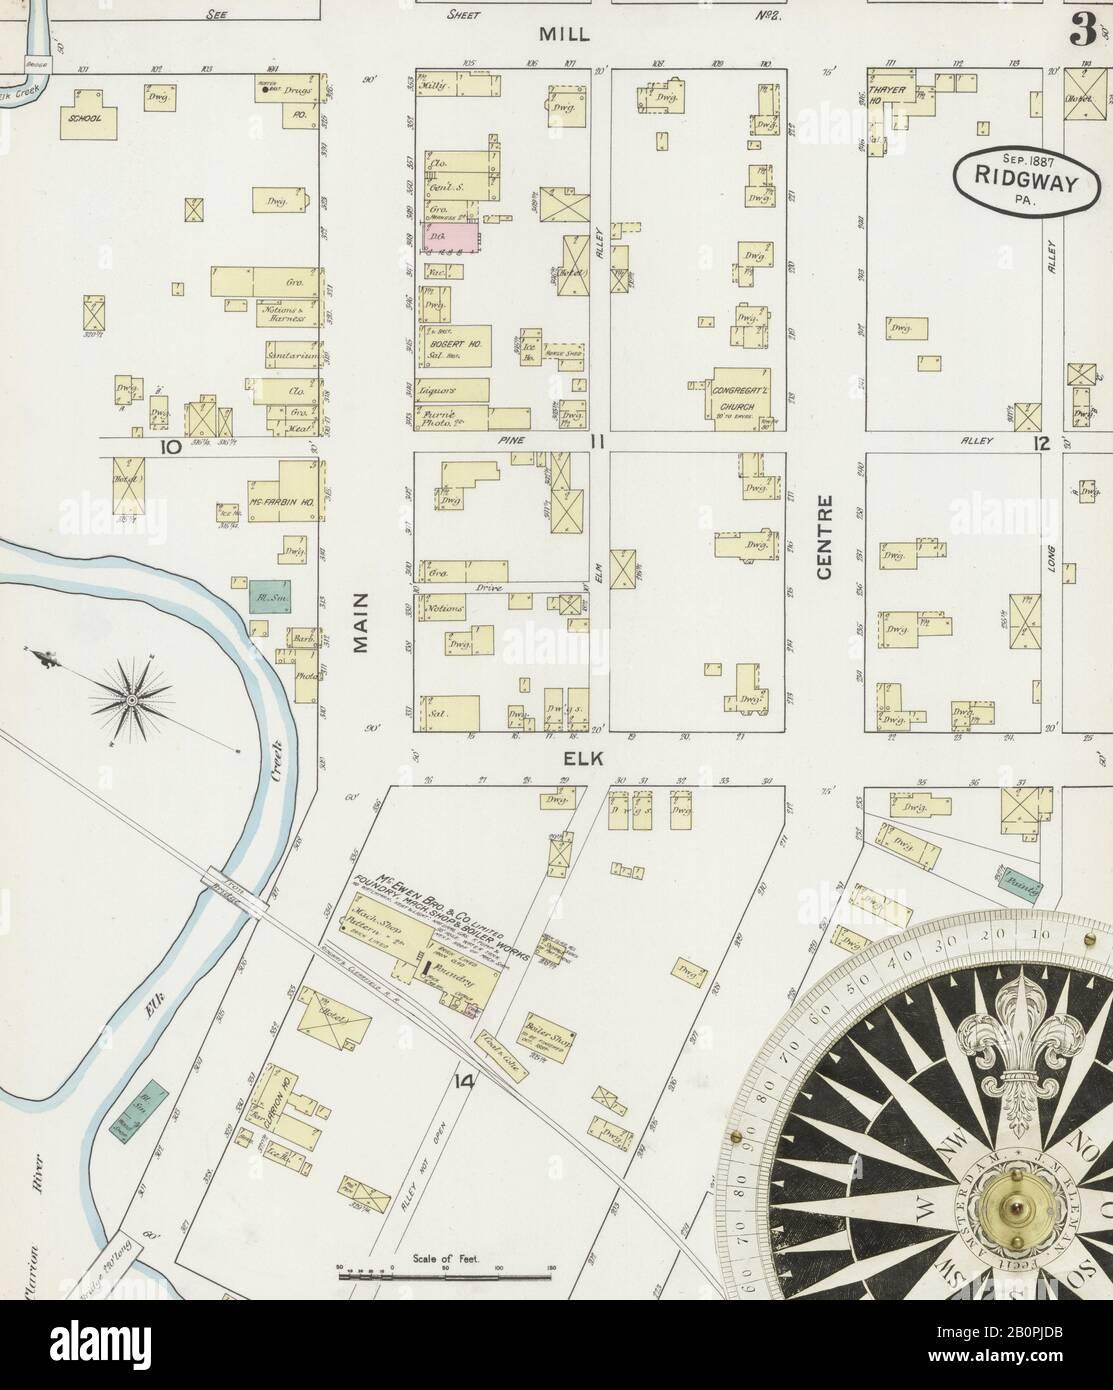 Imagen 3 Del Mapa Del Seguro De Incendios Sanborn De Ridgway, Elk County, Pennsylvania. 1887 De Septiembre. 5 Hoja(s), América, mapa de calles con una brújula del siglo Xix Foto de stock